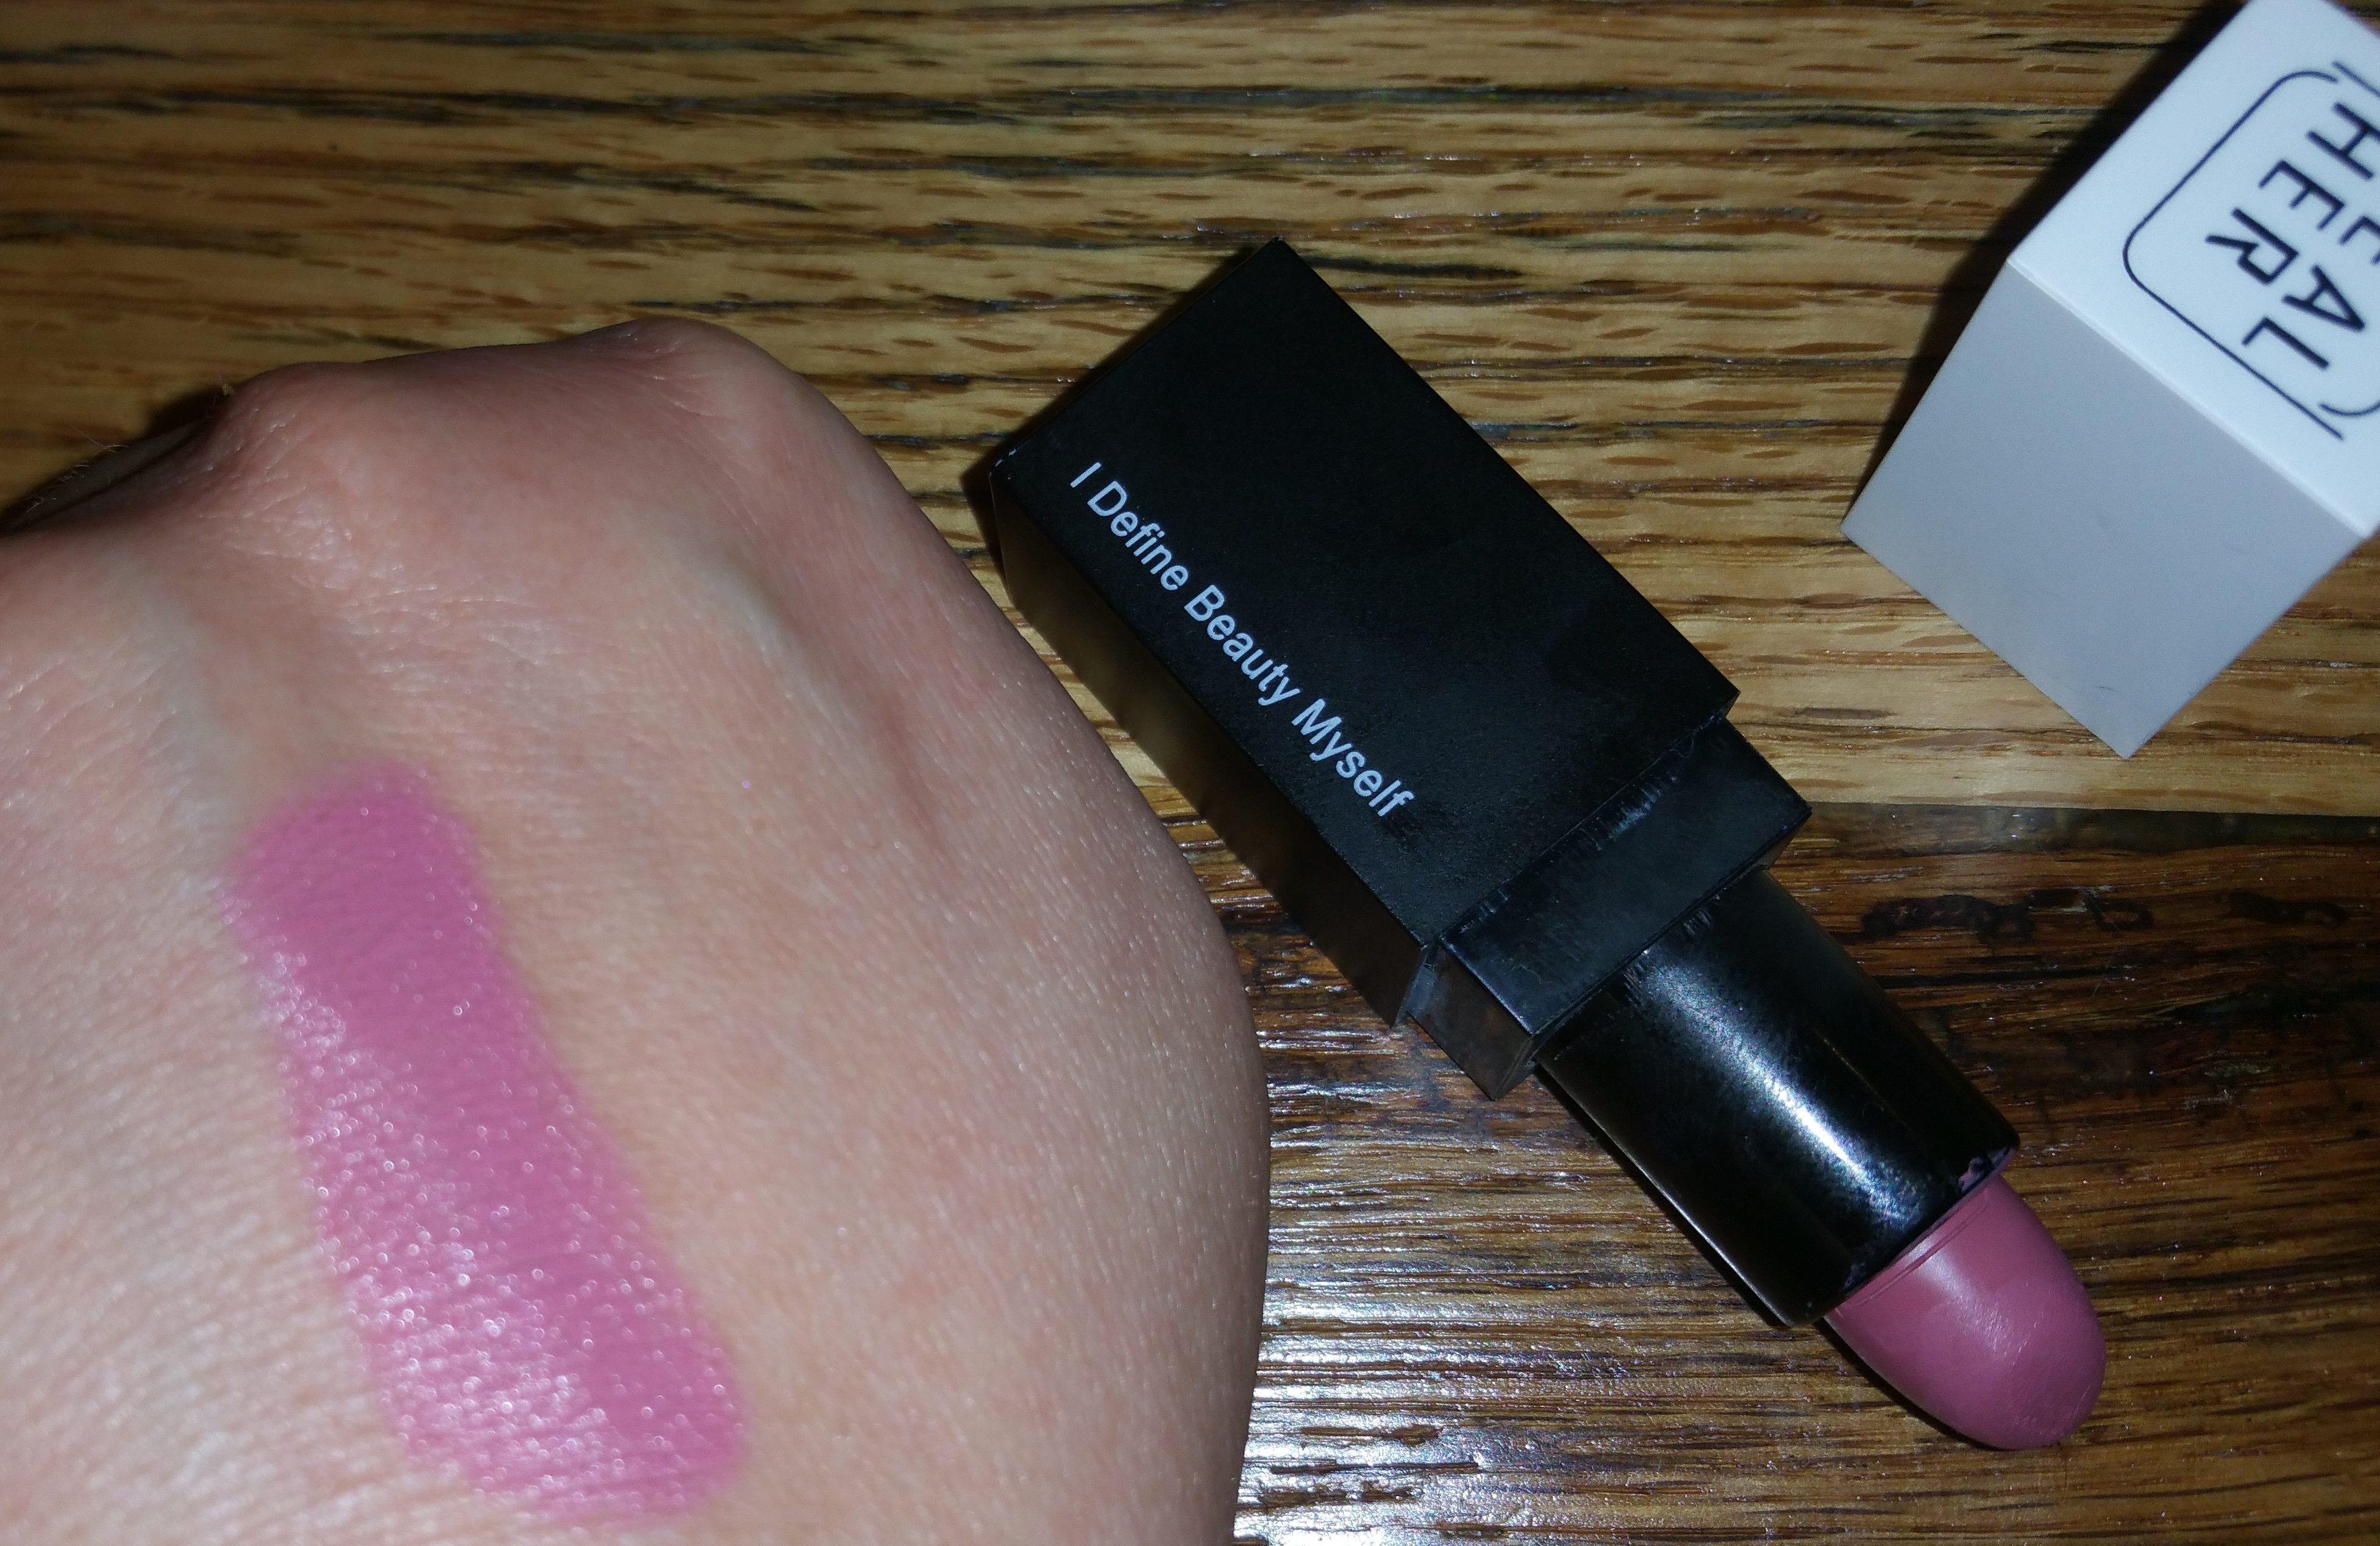 RealHer Lipstick in I Define Beauty Myself